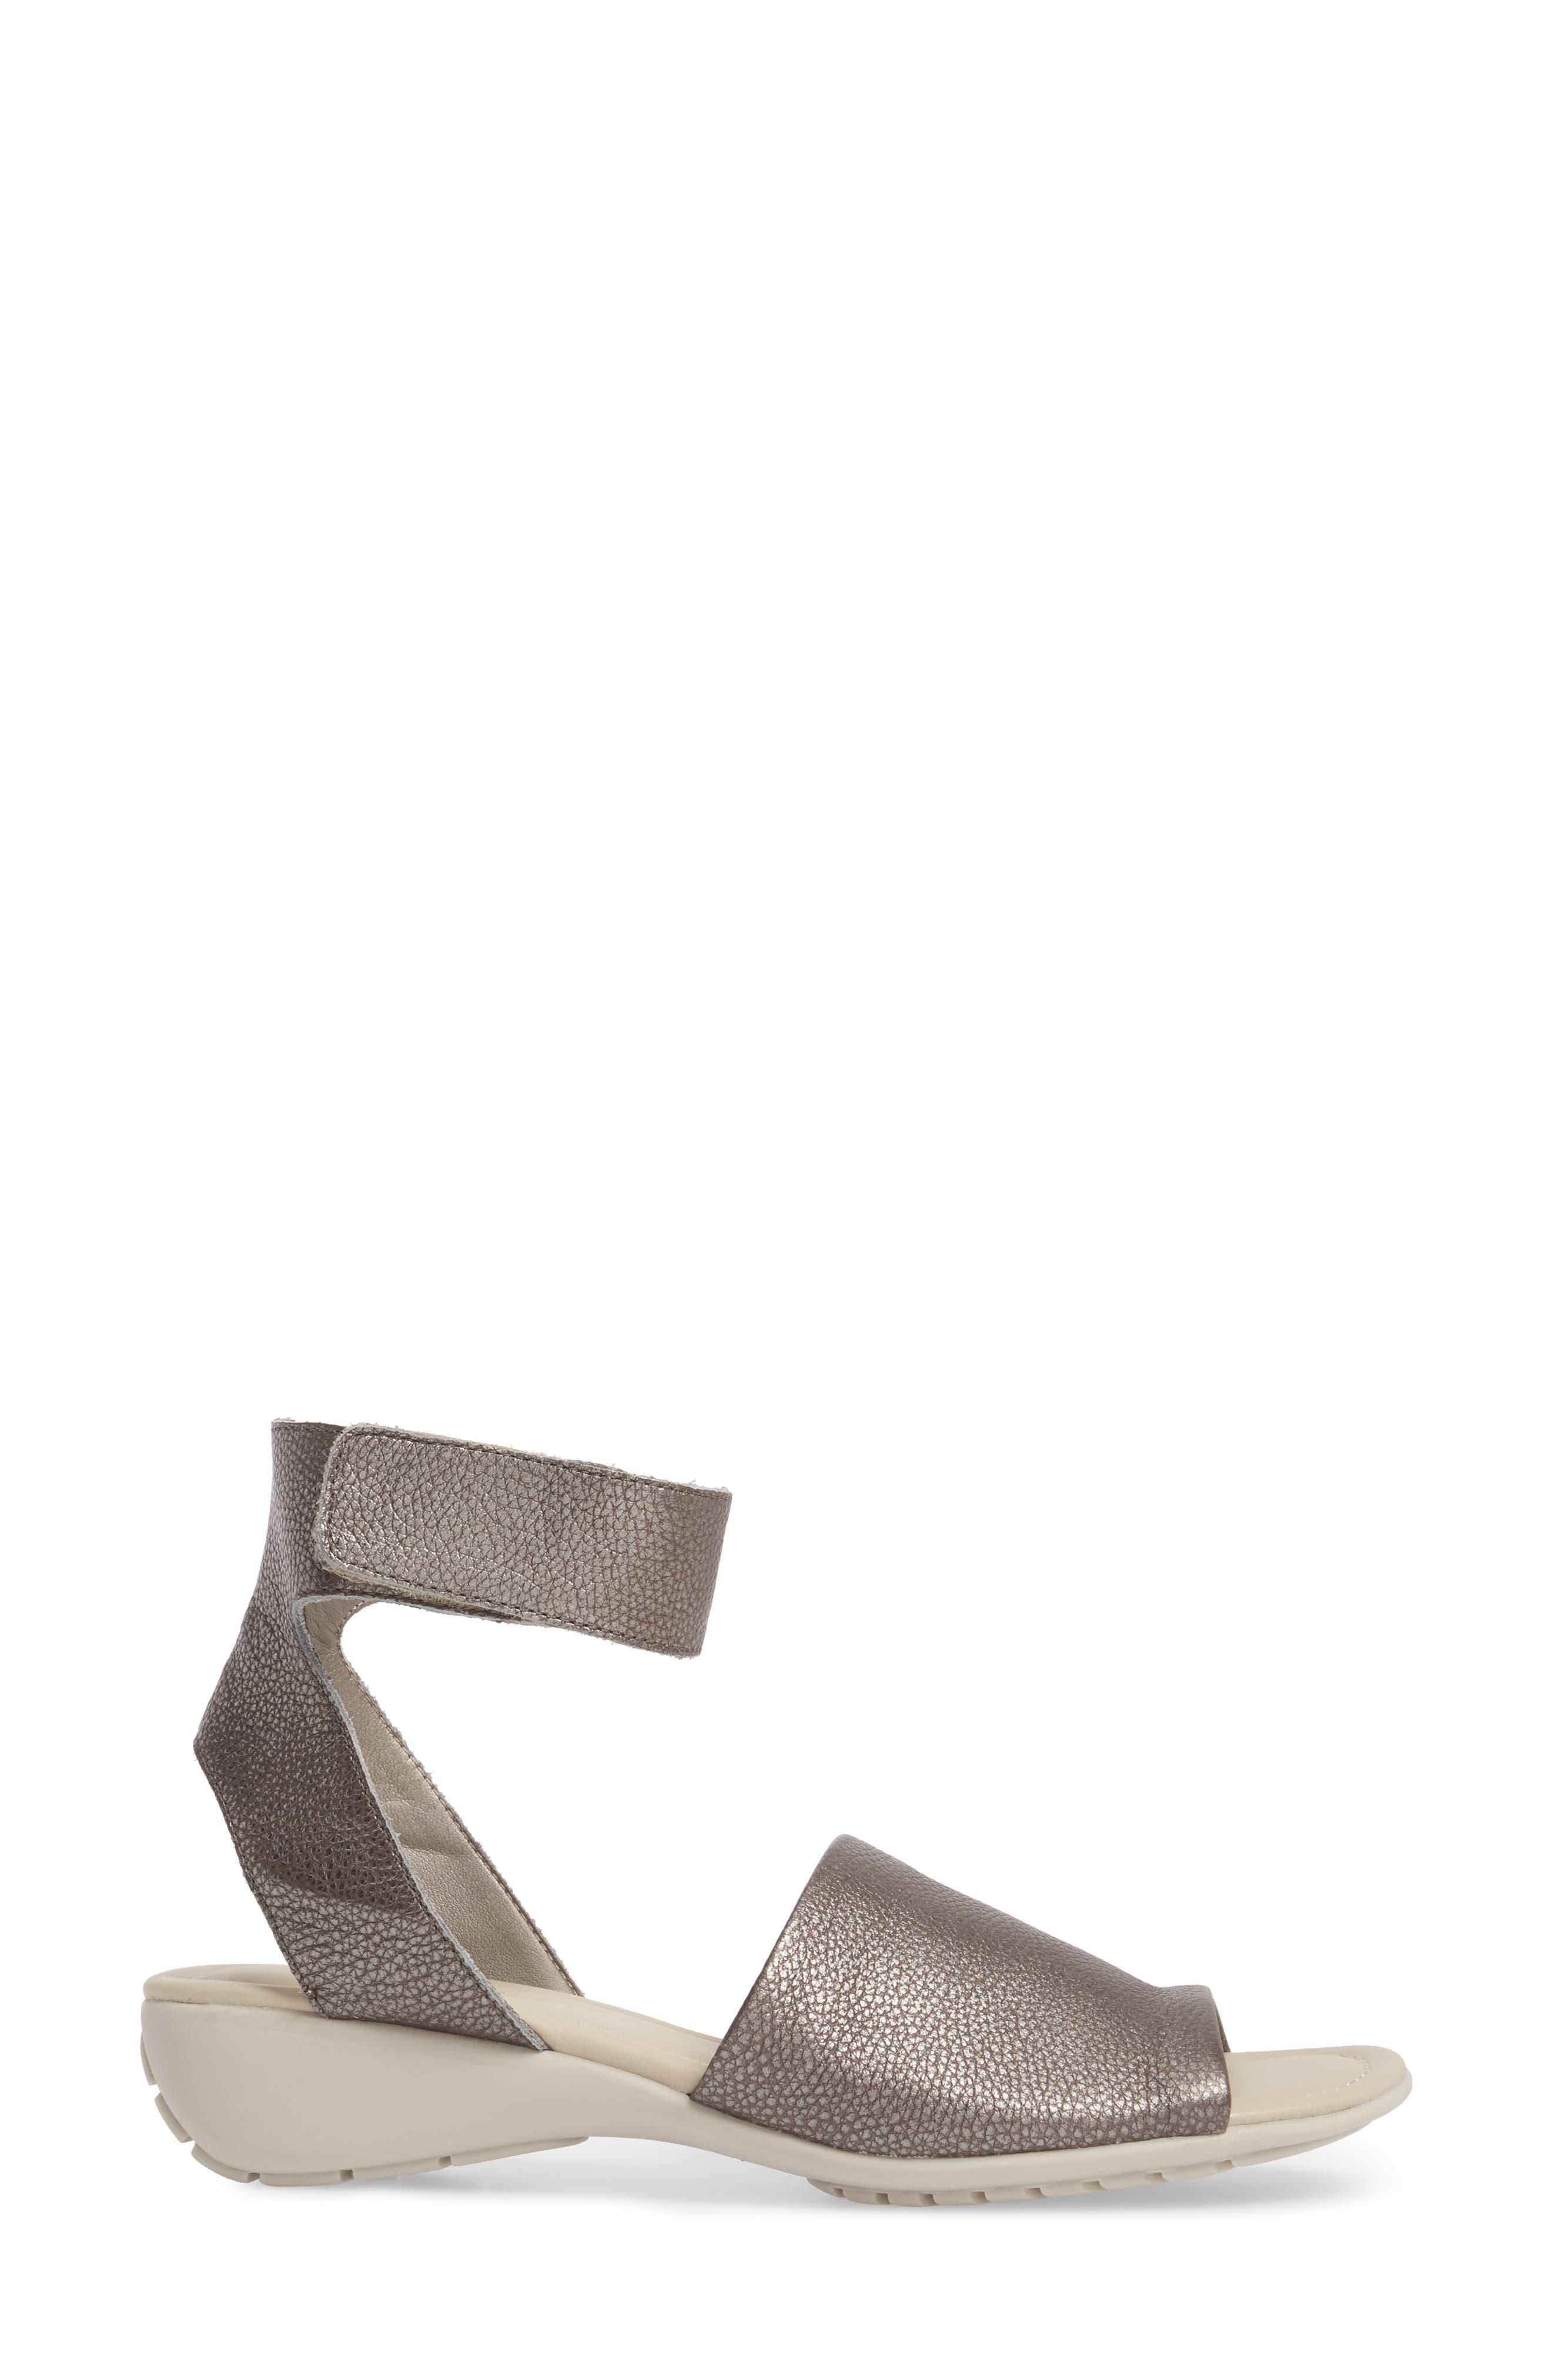 'Beglad' Leather Ankle Strap Sandal,                             Alternate thumbnail 34, color,